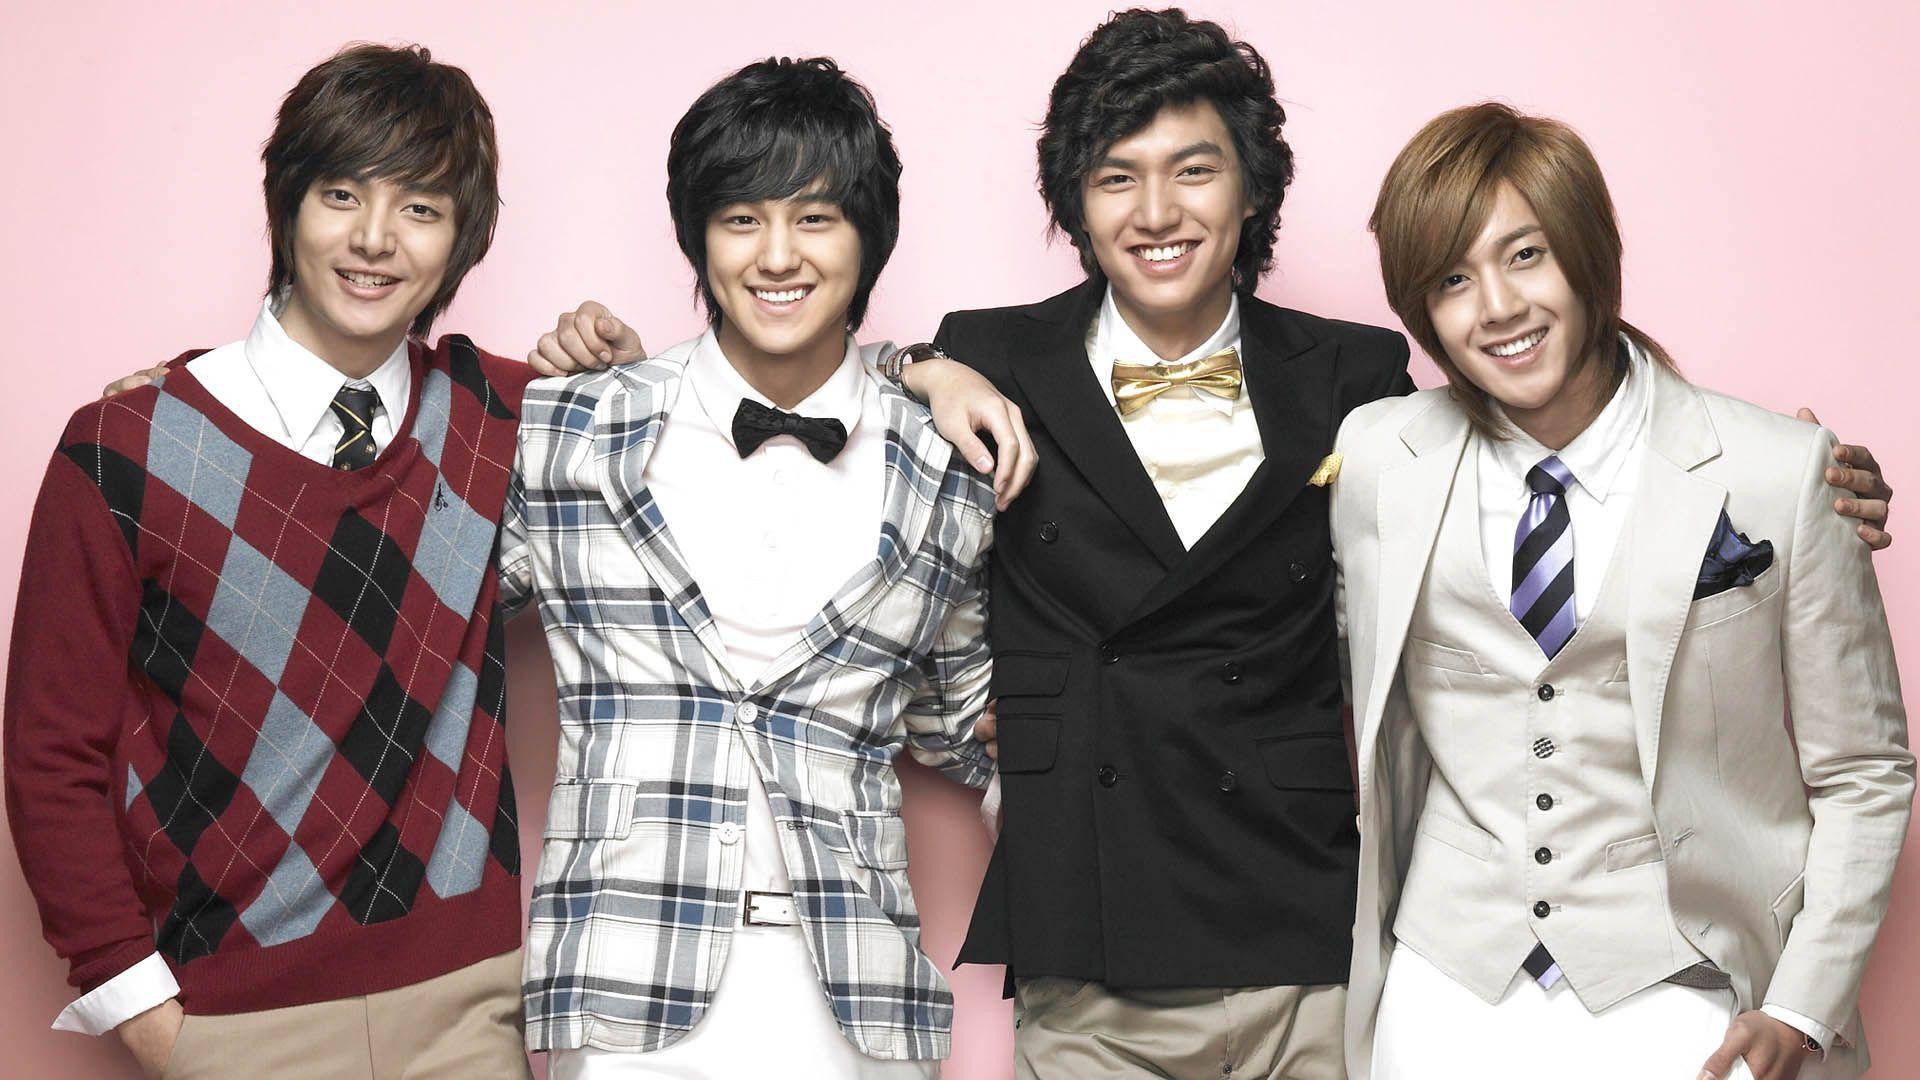 Faith Korean Drama Wallpapers - Top Free Faith Korean Drama